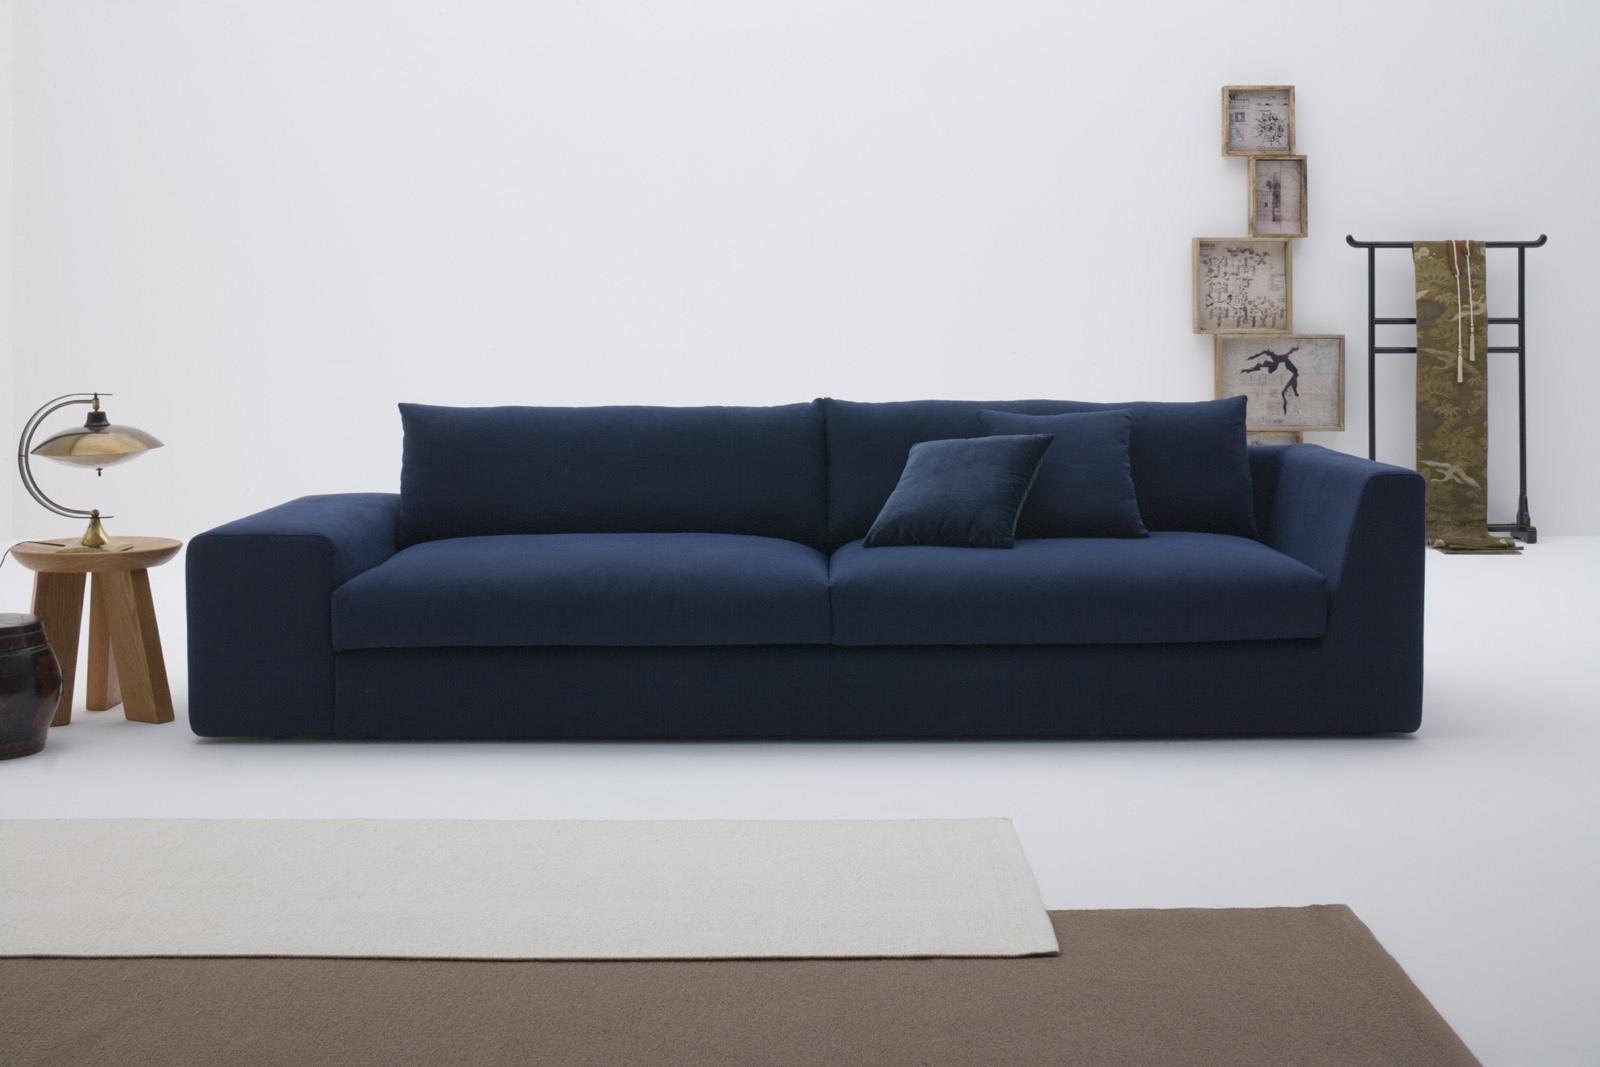 Modular Sofa Newport, Alberta Salotti – Luxury Furniture Mr For Newport Sofas (Image 4 of 20)